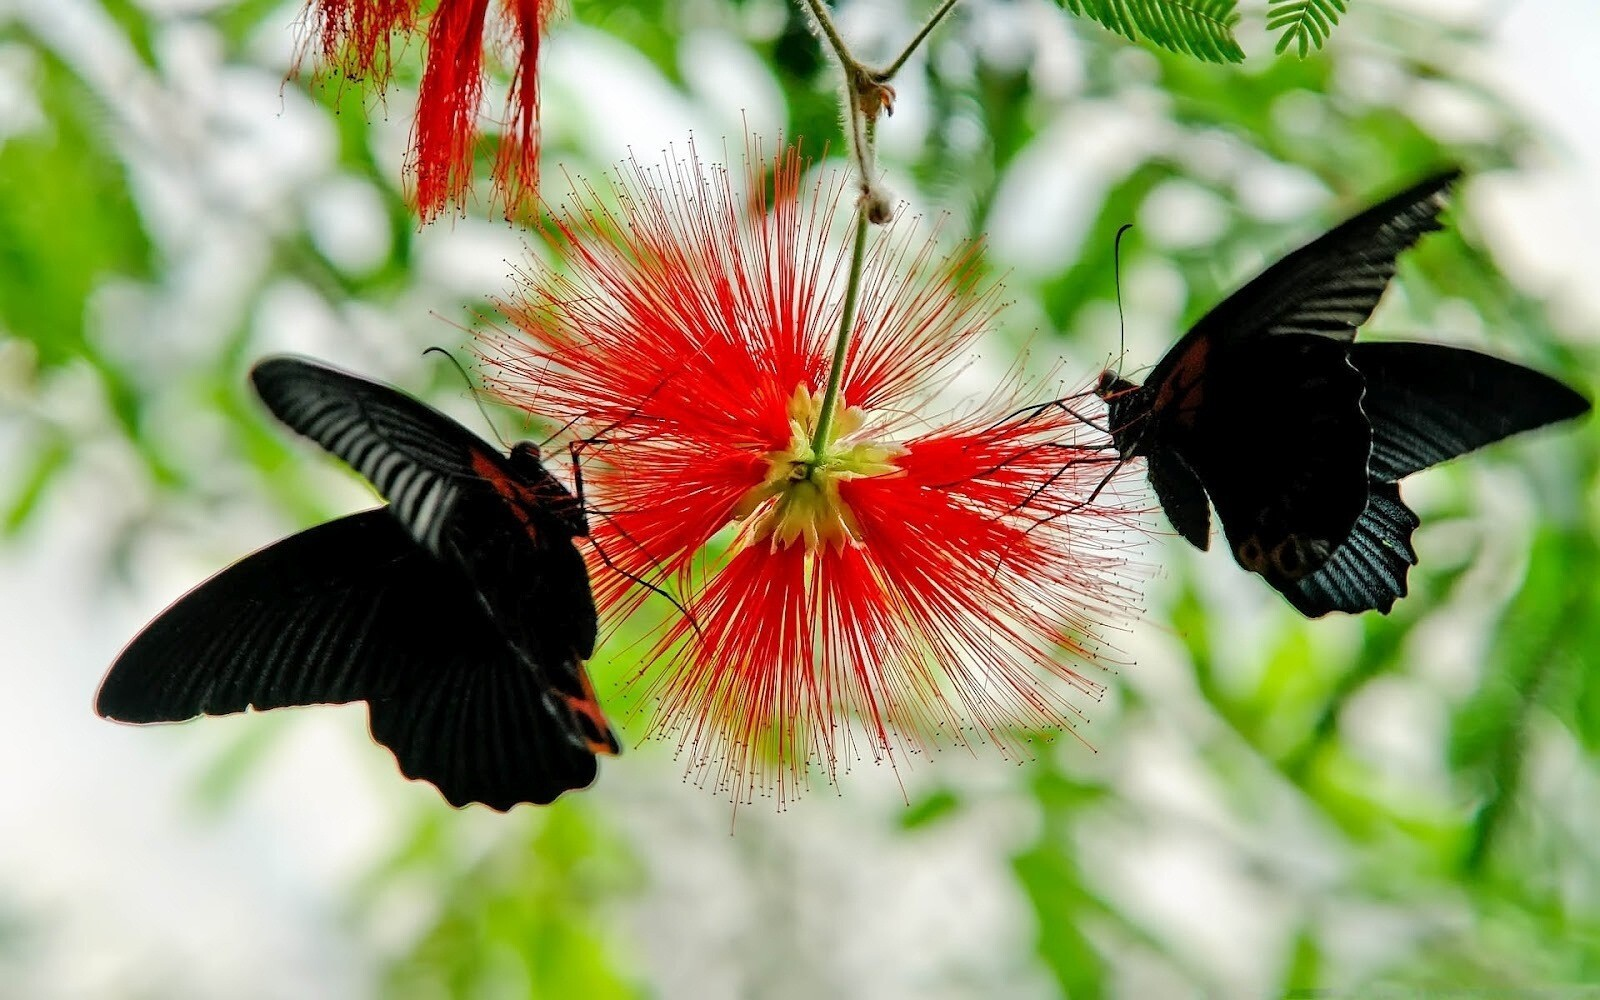 Two Black Butterfly on Flower | HD Wallpapers